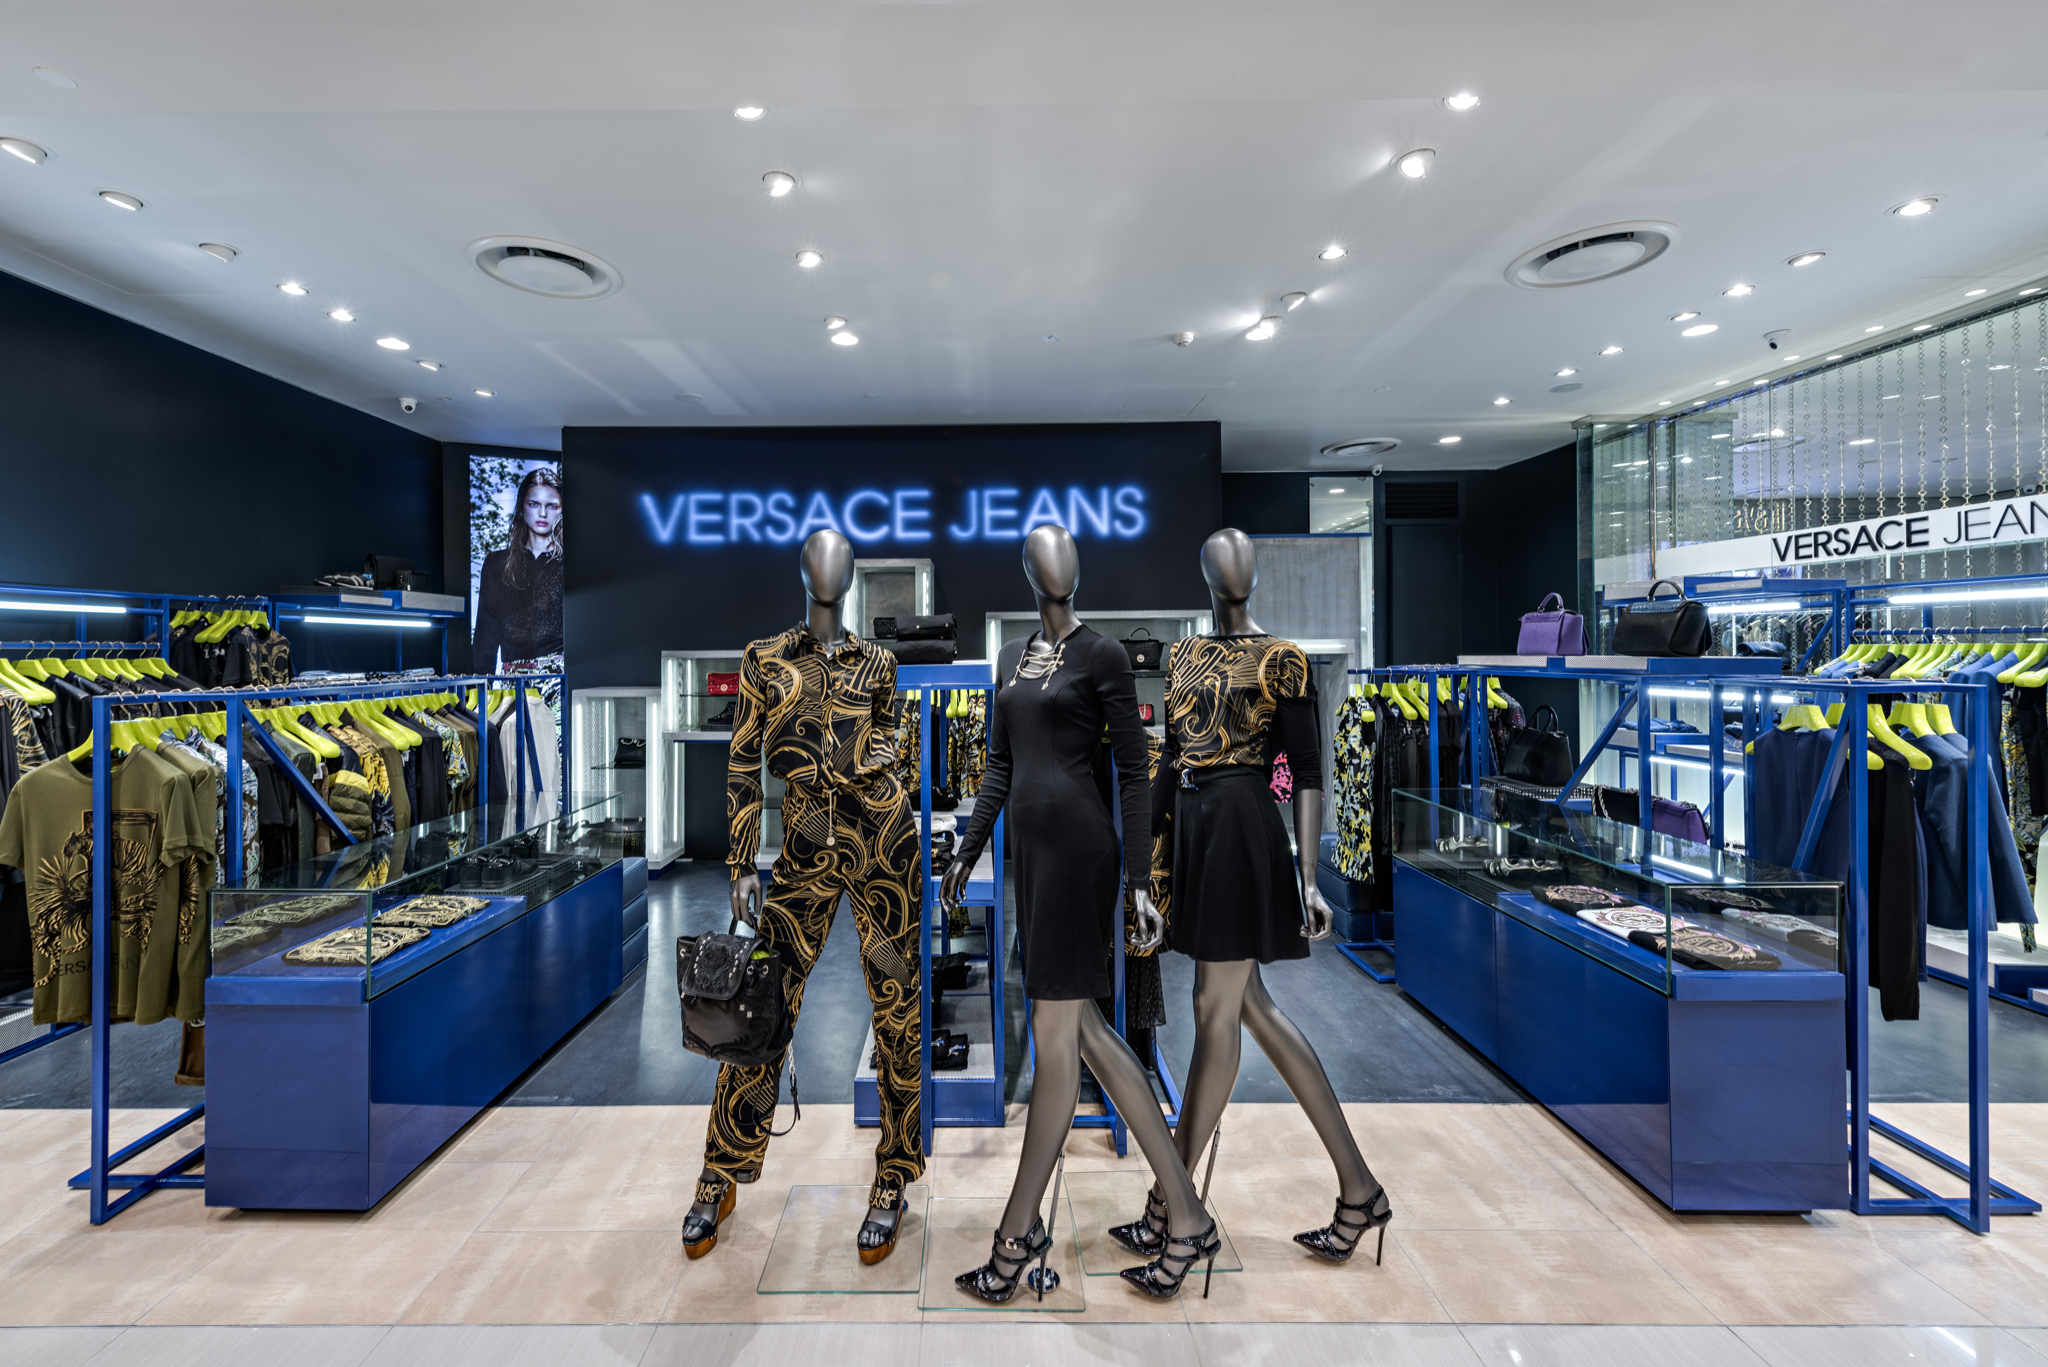 20160729 - Versace Jean - HCM - Commercial - Interior - Store - Retouch 0004.jpg